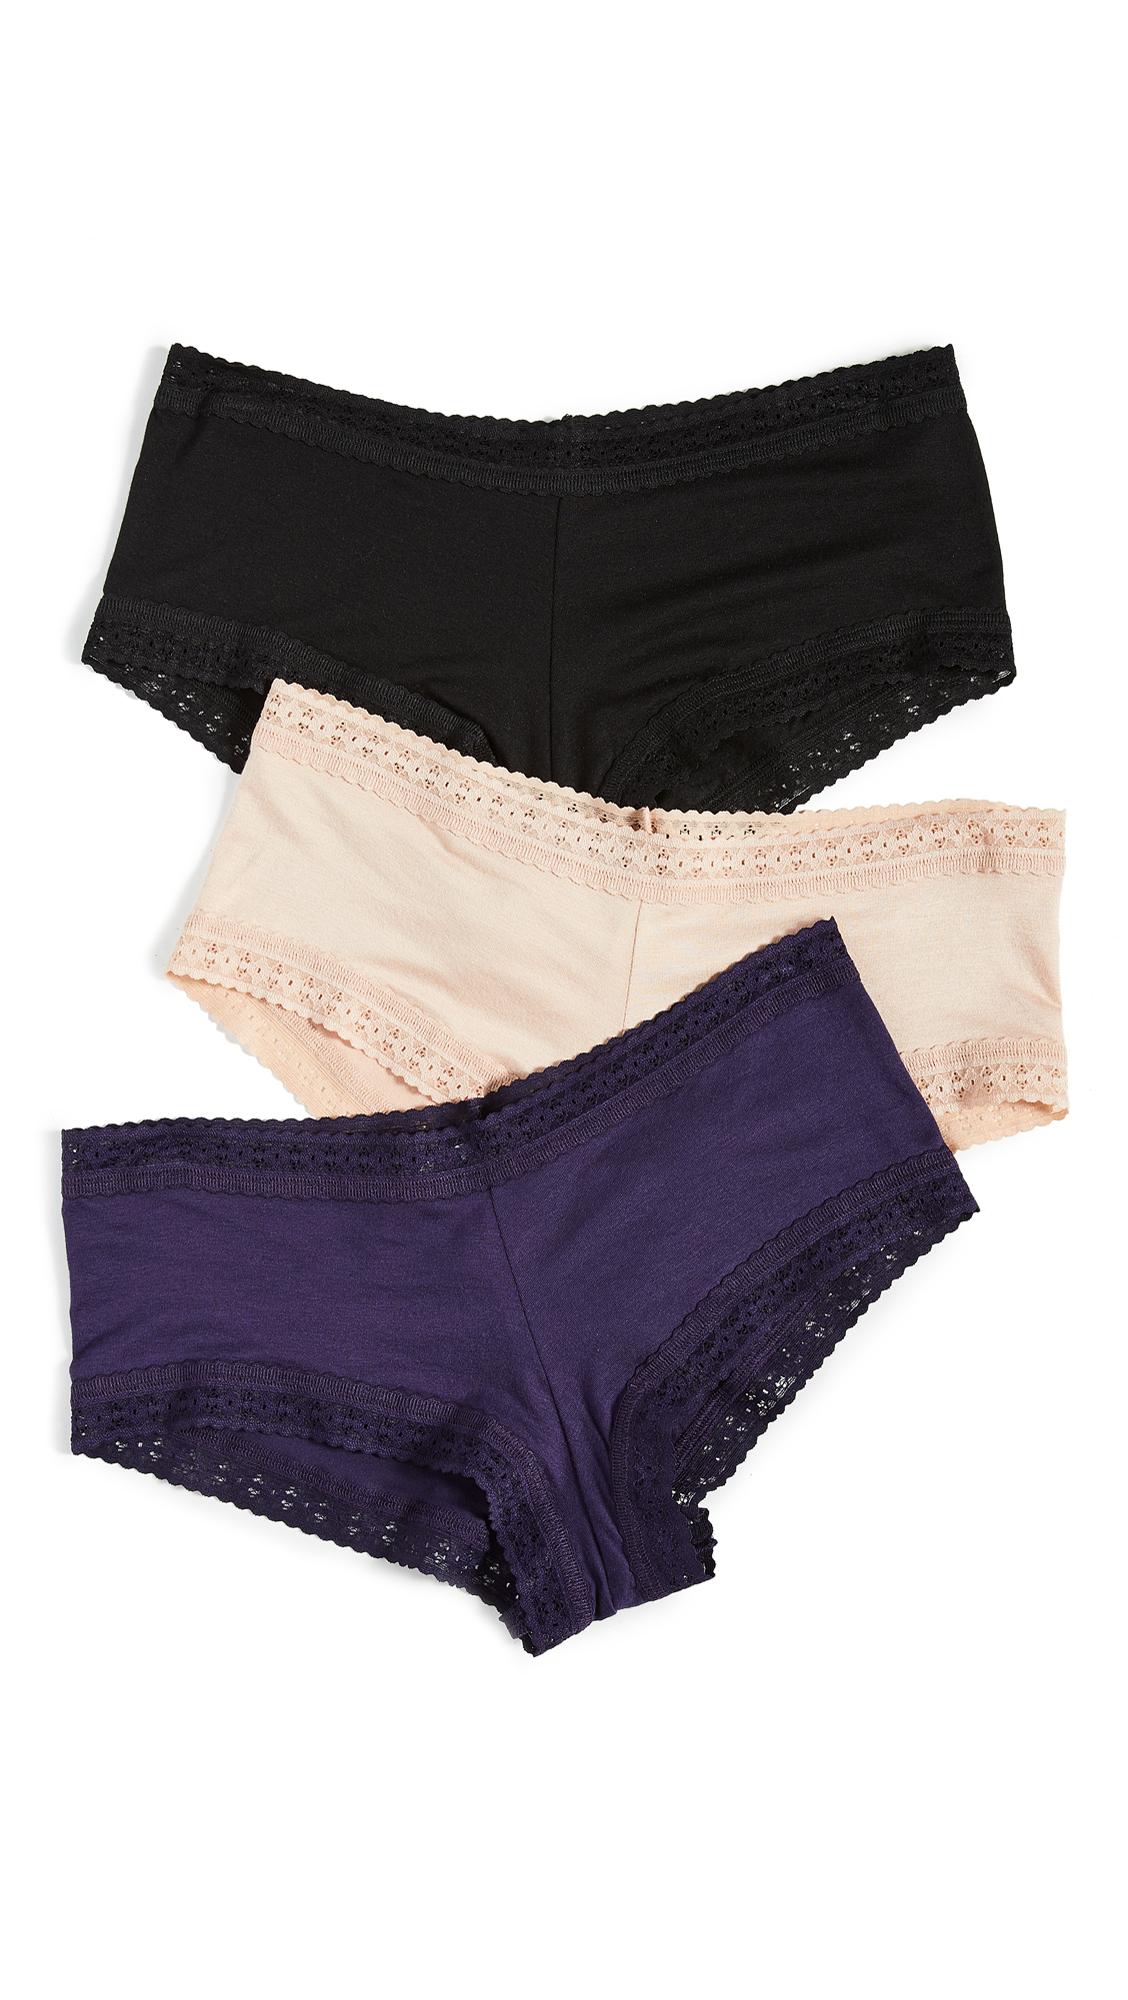 Hanky Panky Dream Boy Shorts 3 Pack